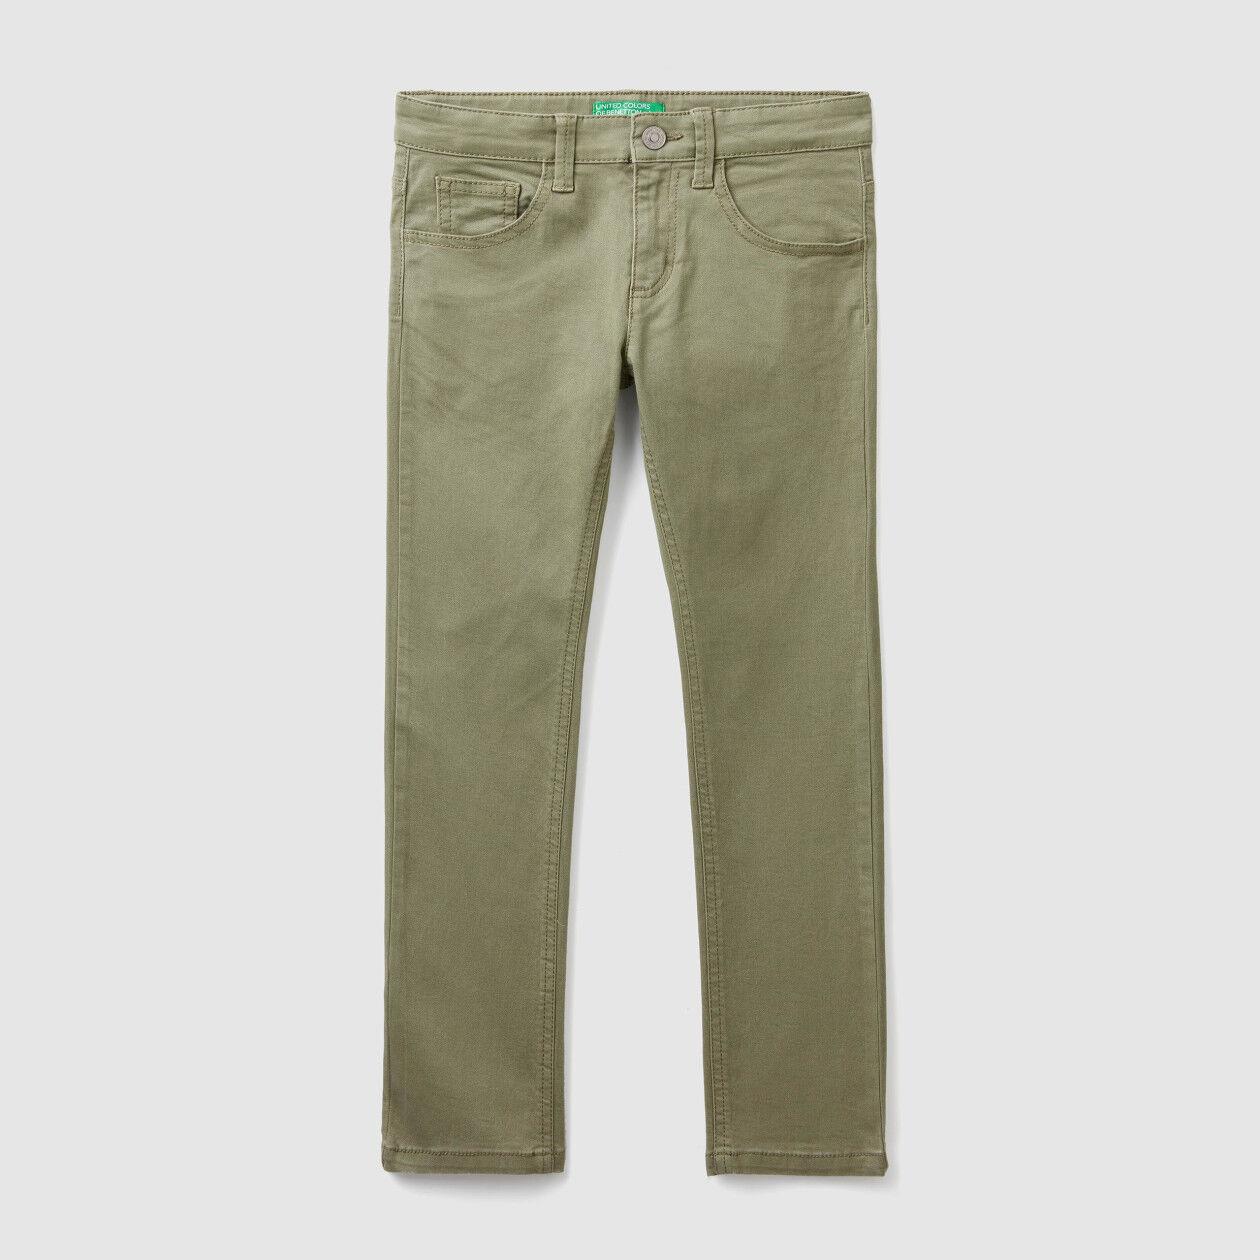 Five pocket slim fit pants